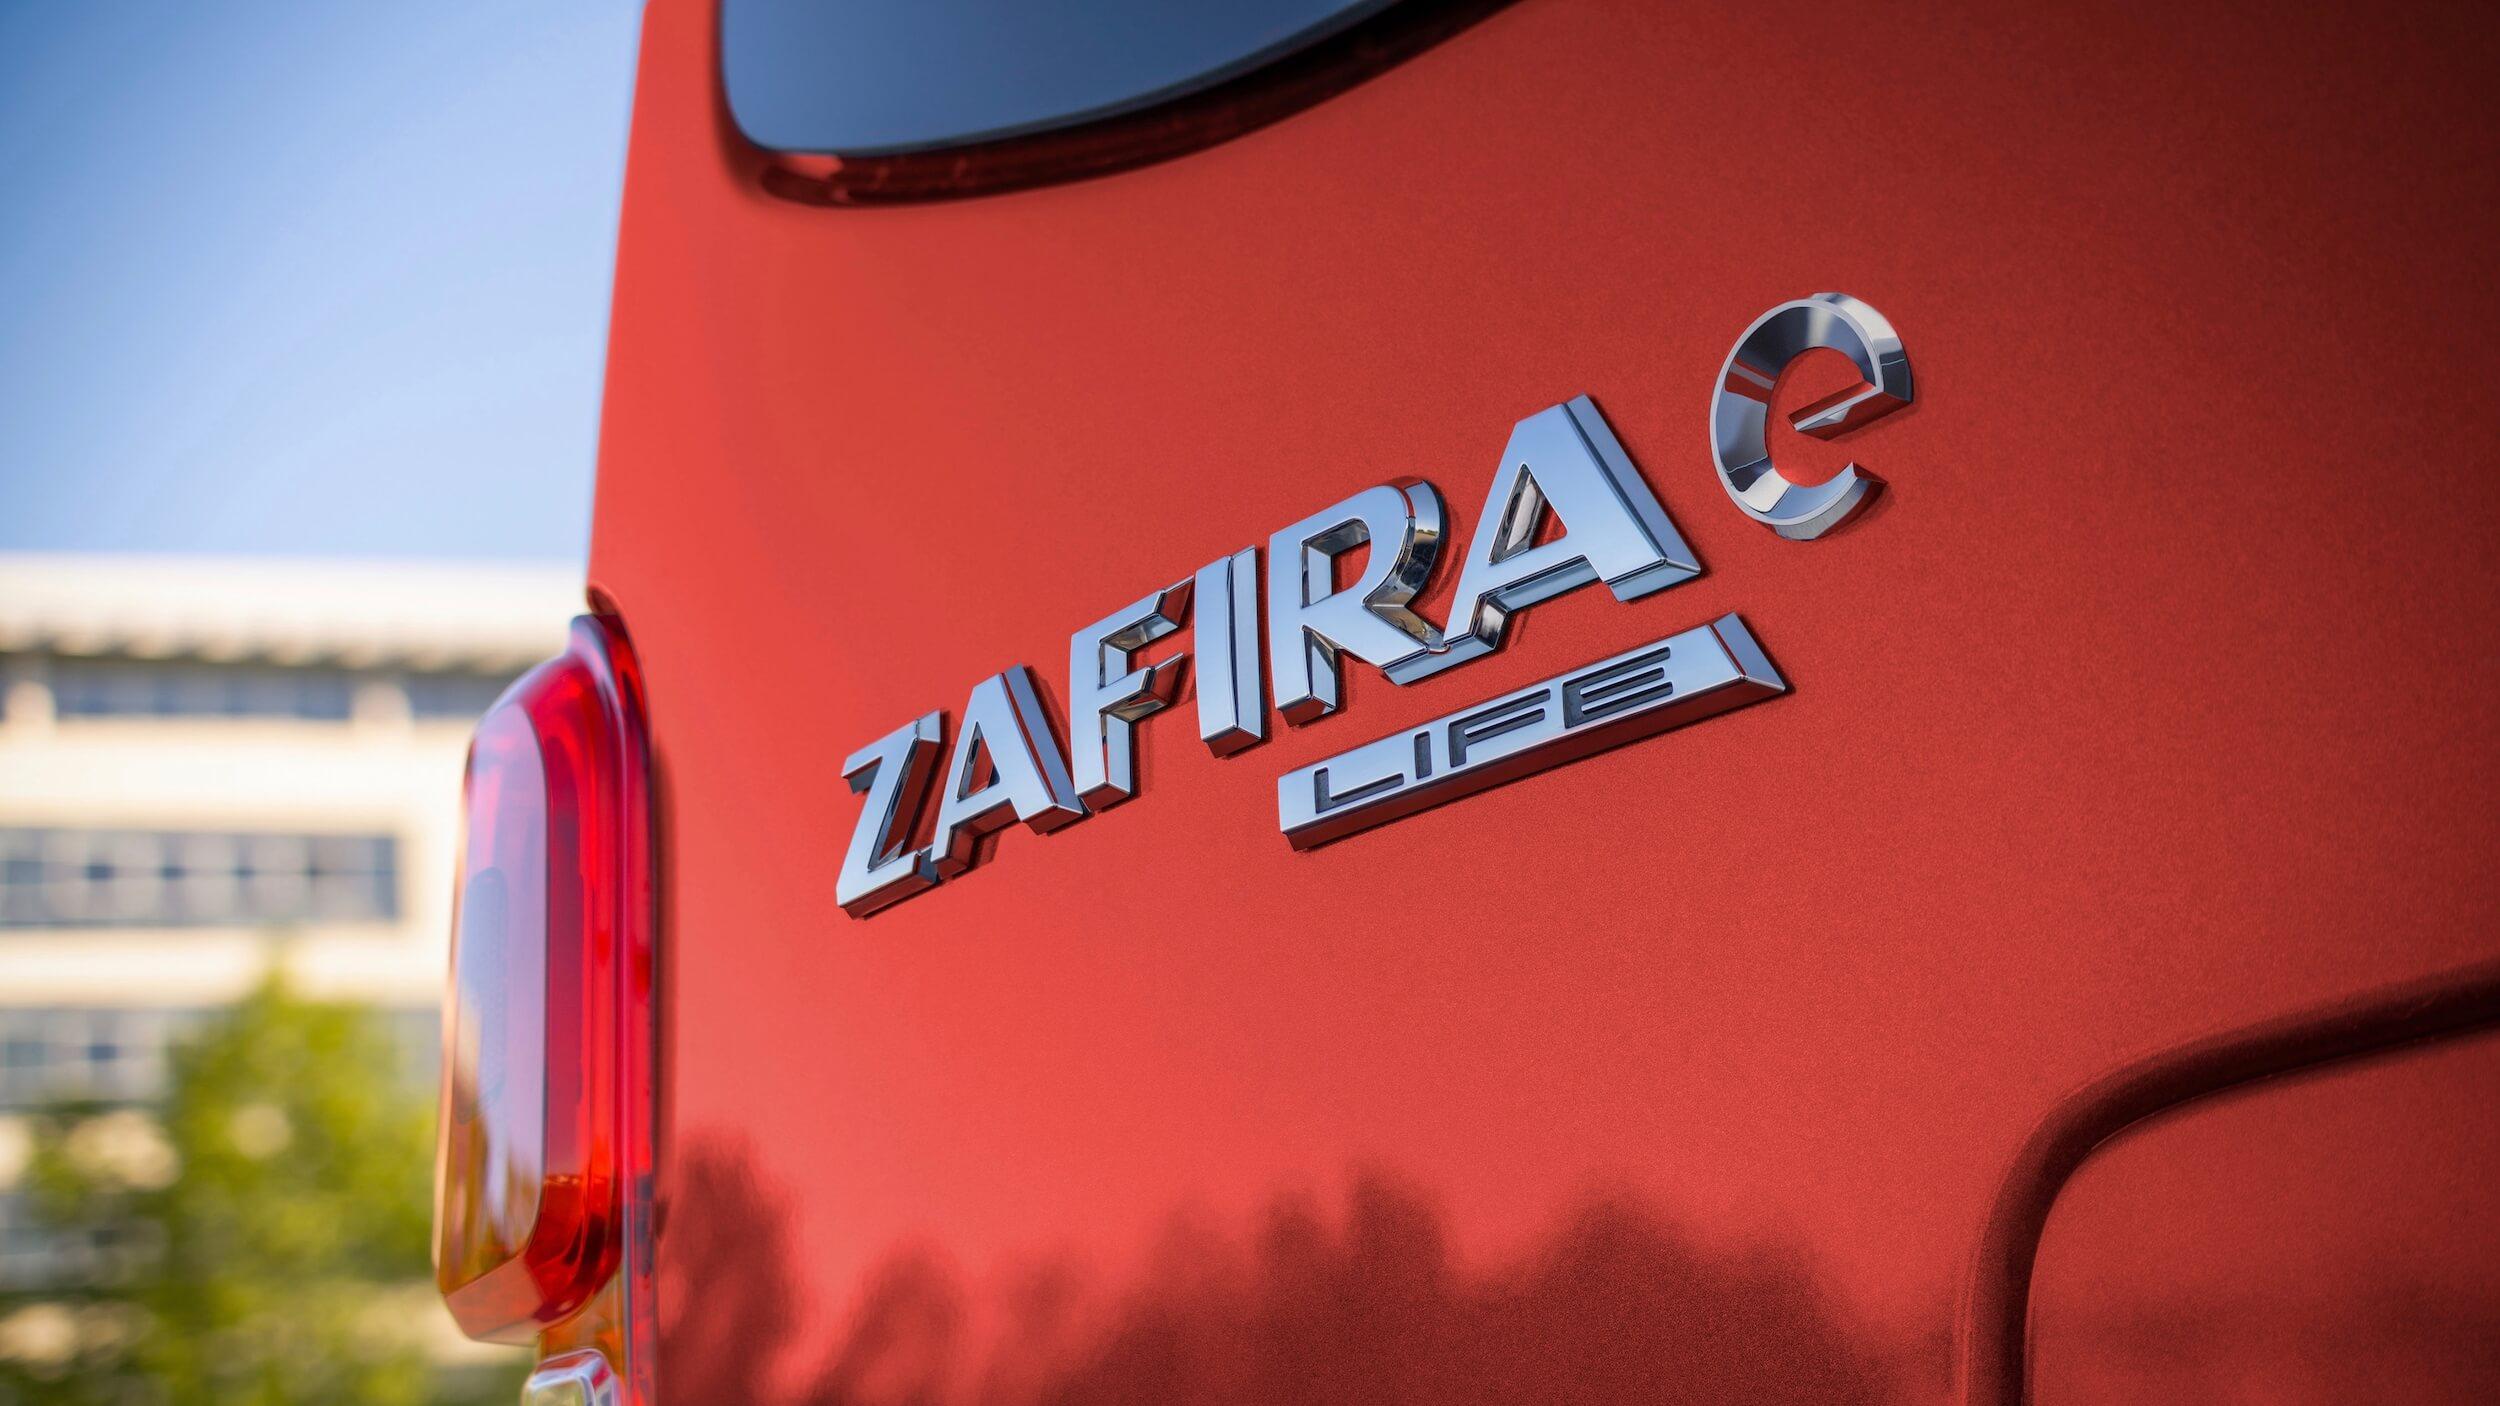 Elektrische Opel Zafira e logo